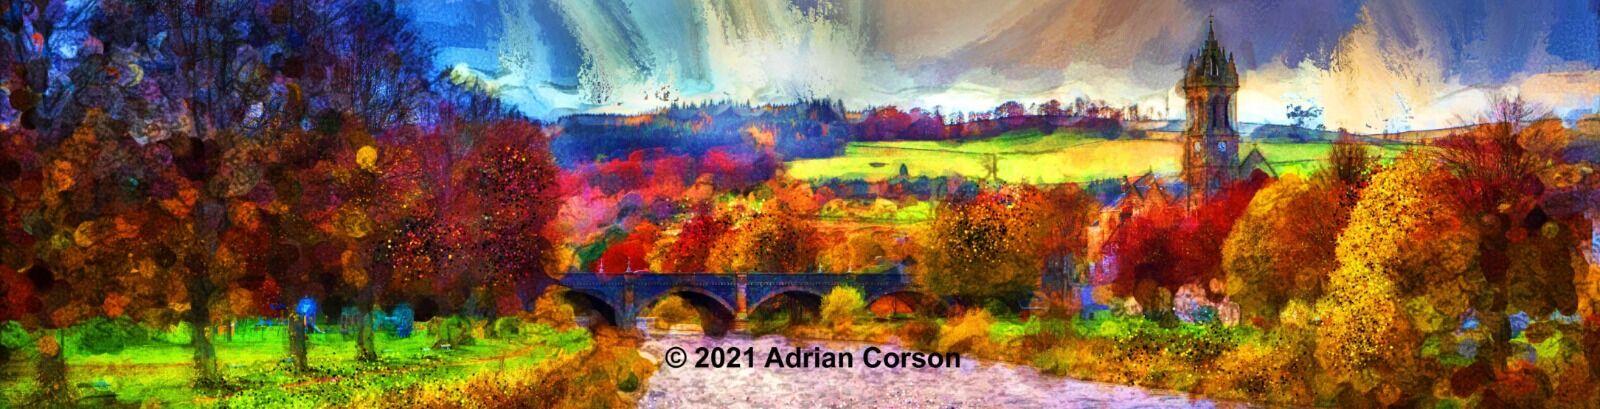 102-autumn town